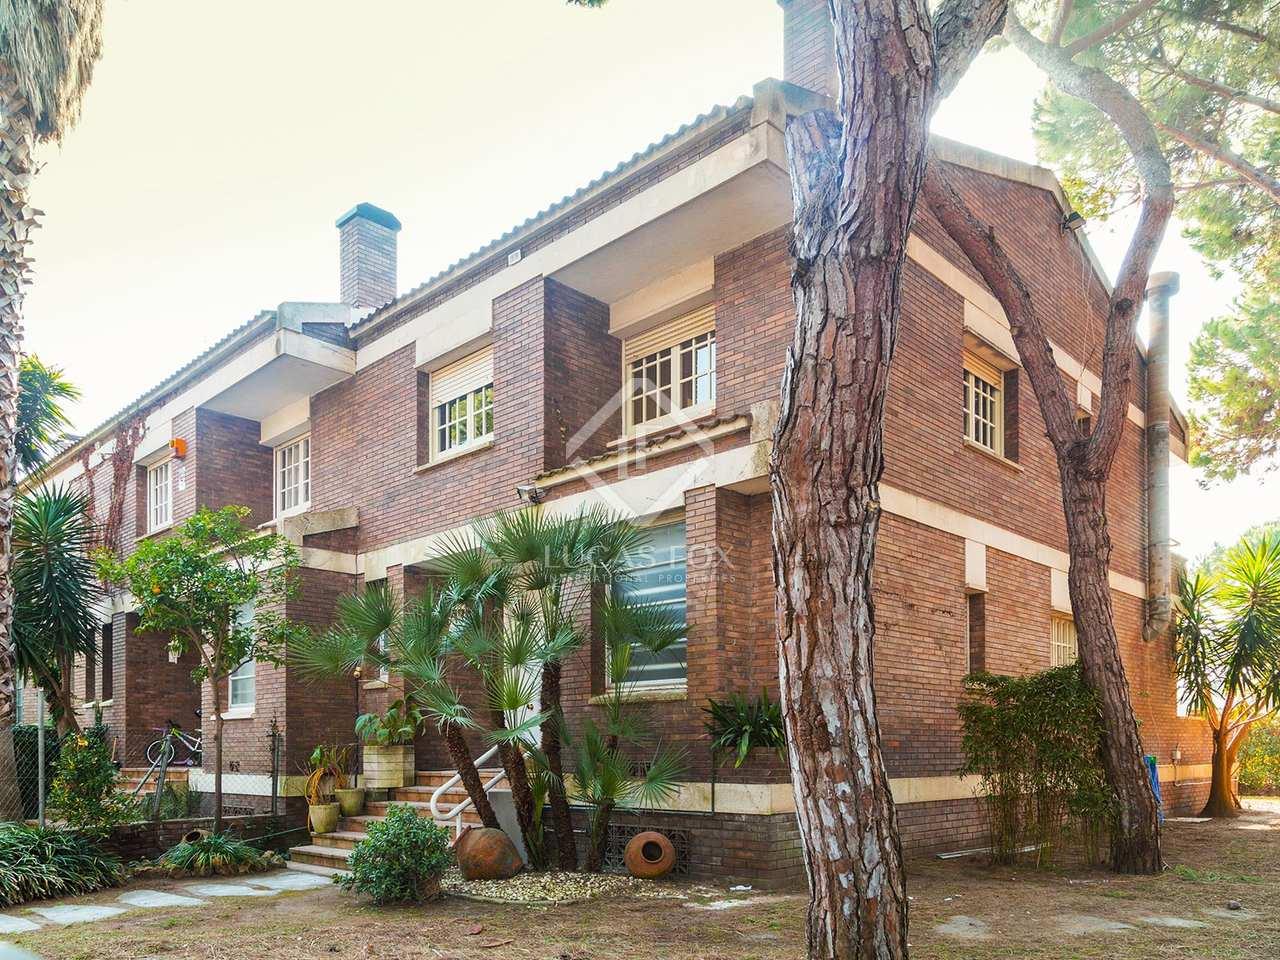 Casa en venta en castelldefels gav mar cerca de barcelona - Casas gava mar ...